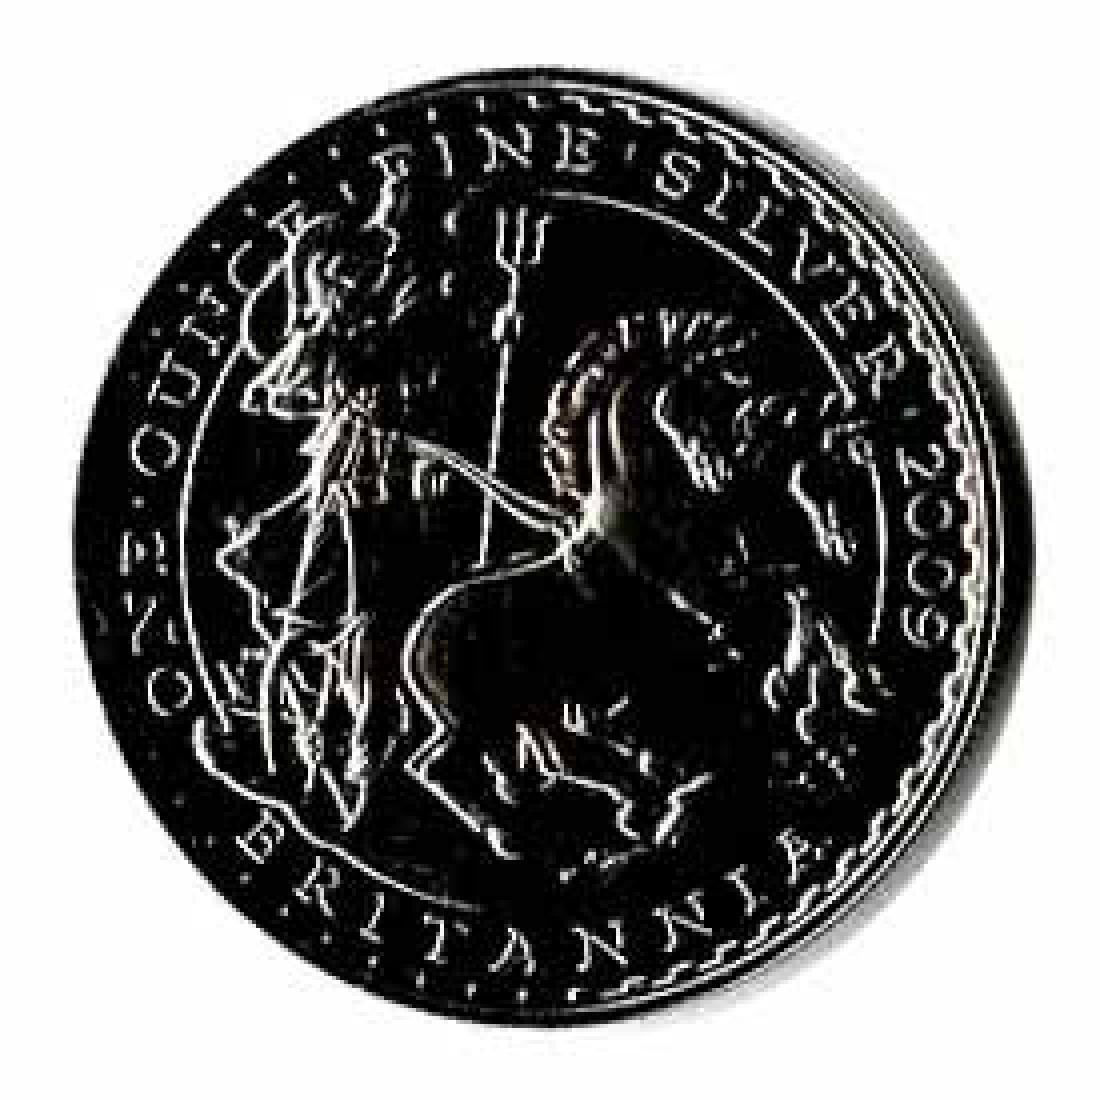 Uncirculated Silver Britannia 1 oz 2009